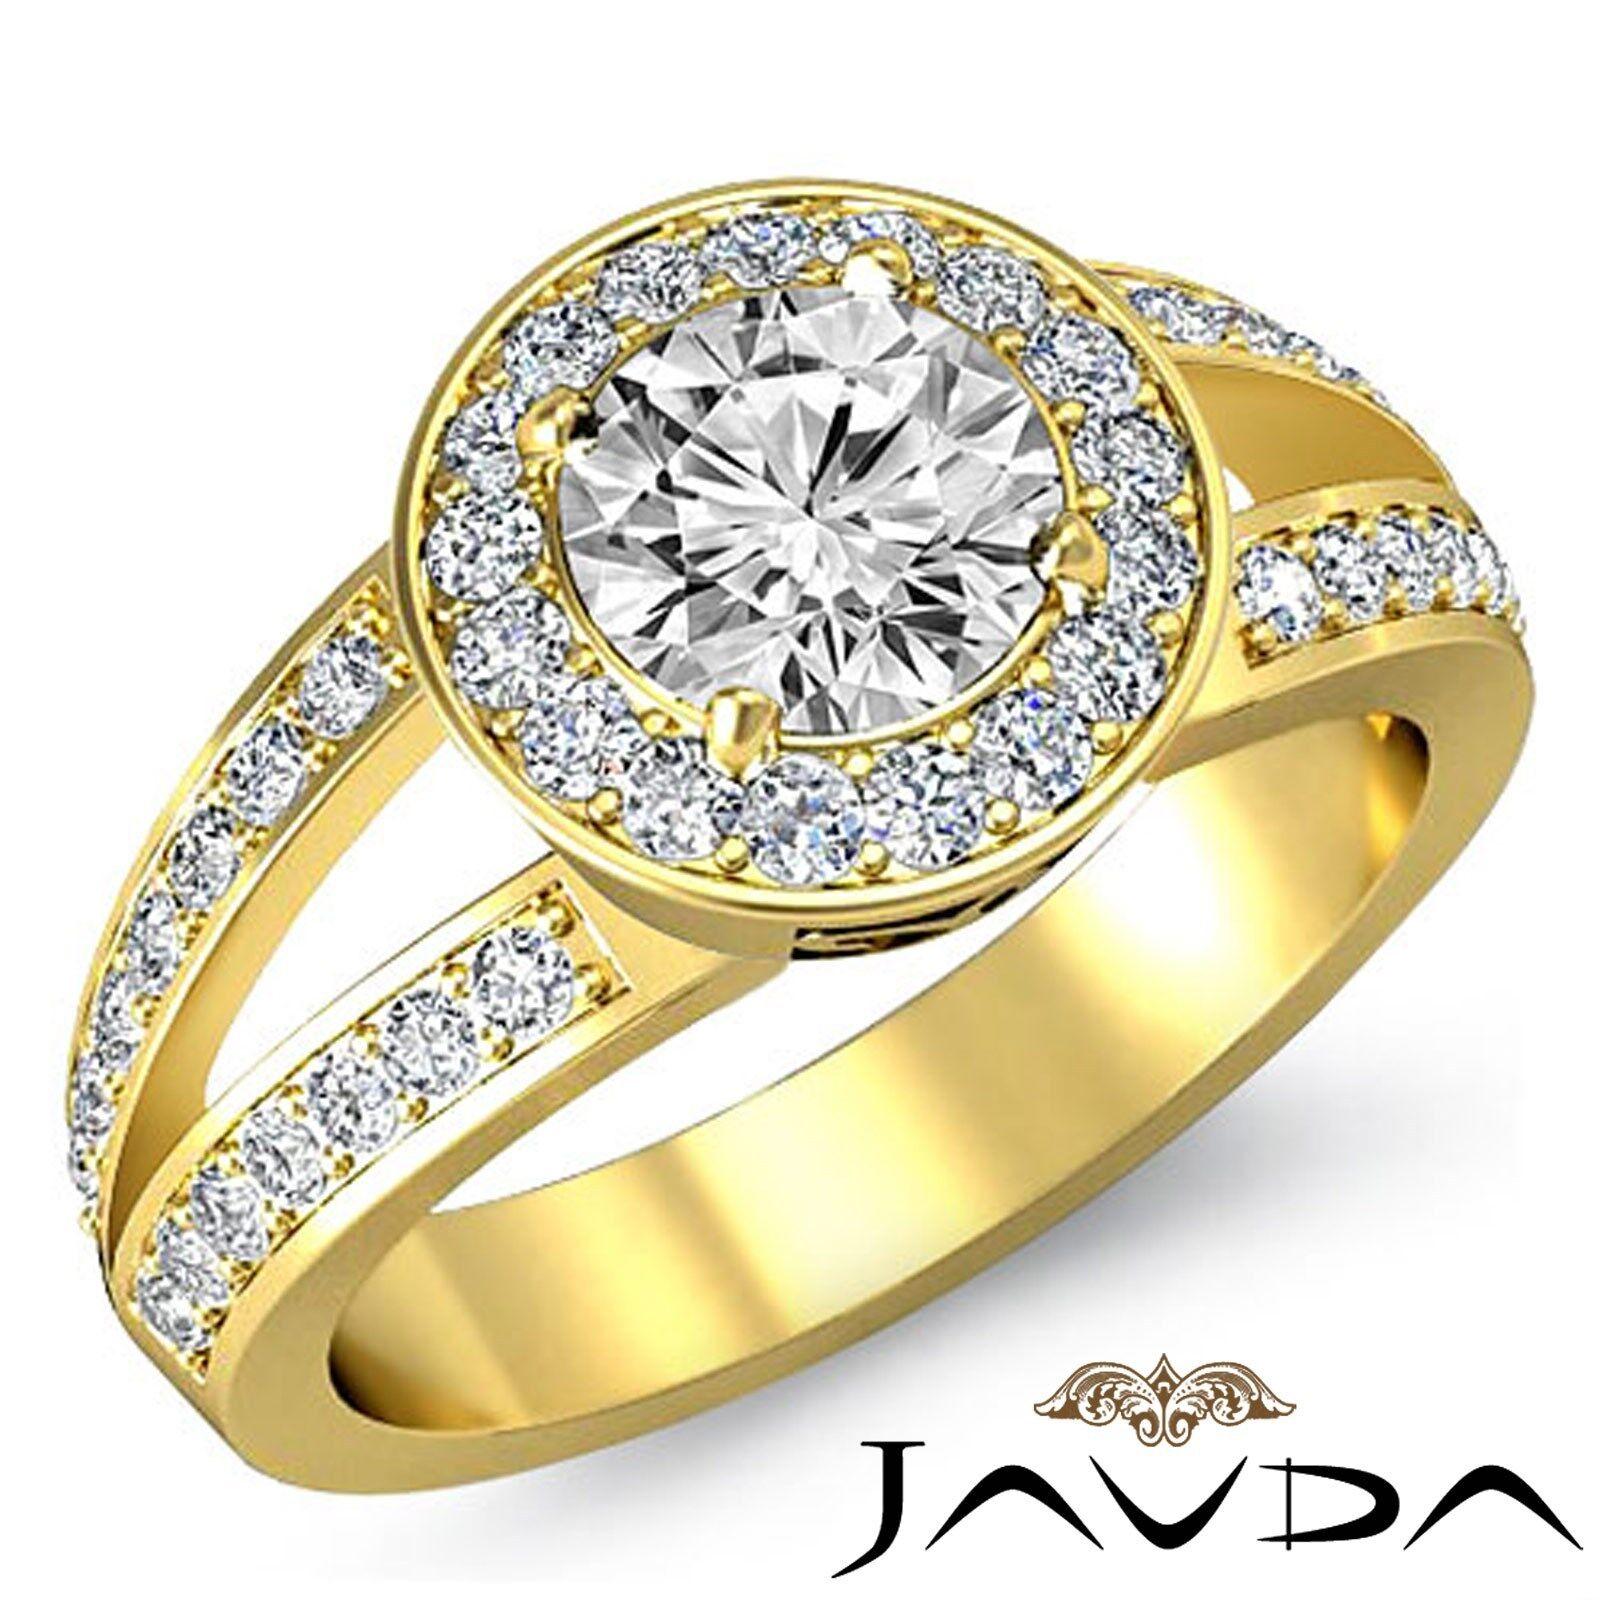 V Shaped Split Shank Round Diamond Engagement Pave Setting Ring GIA I VS2 2.05Ct